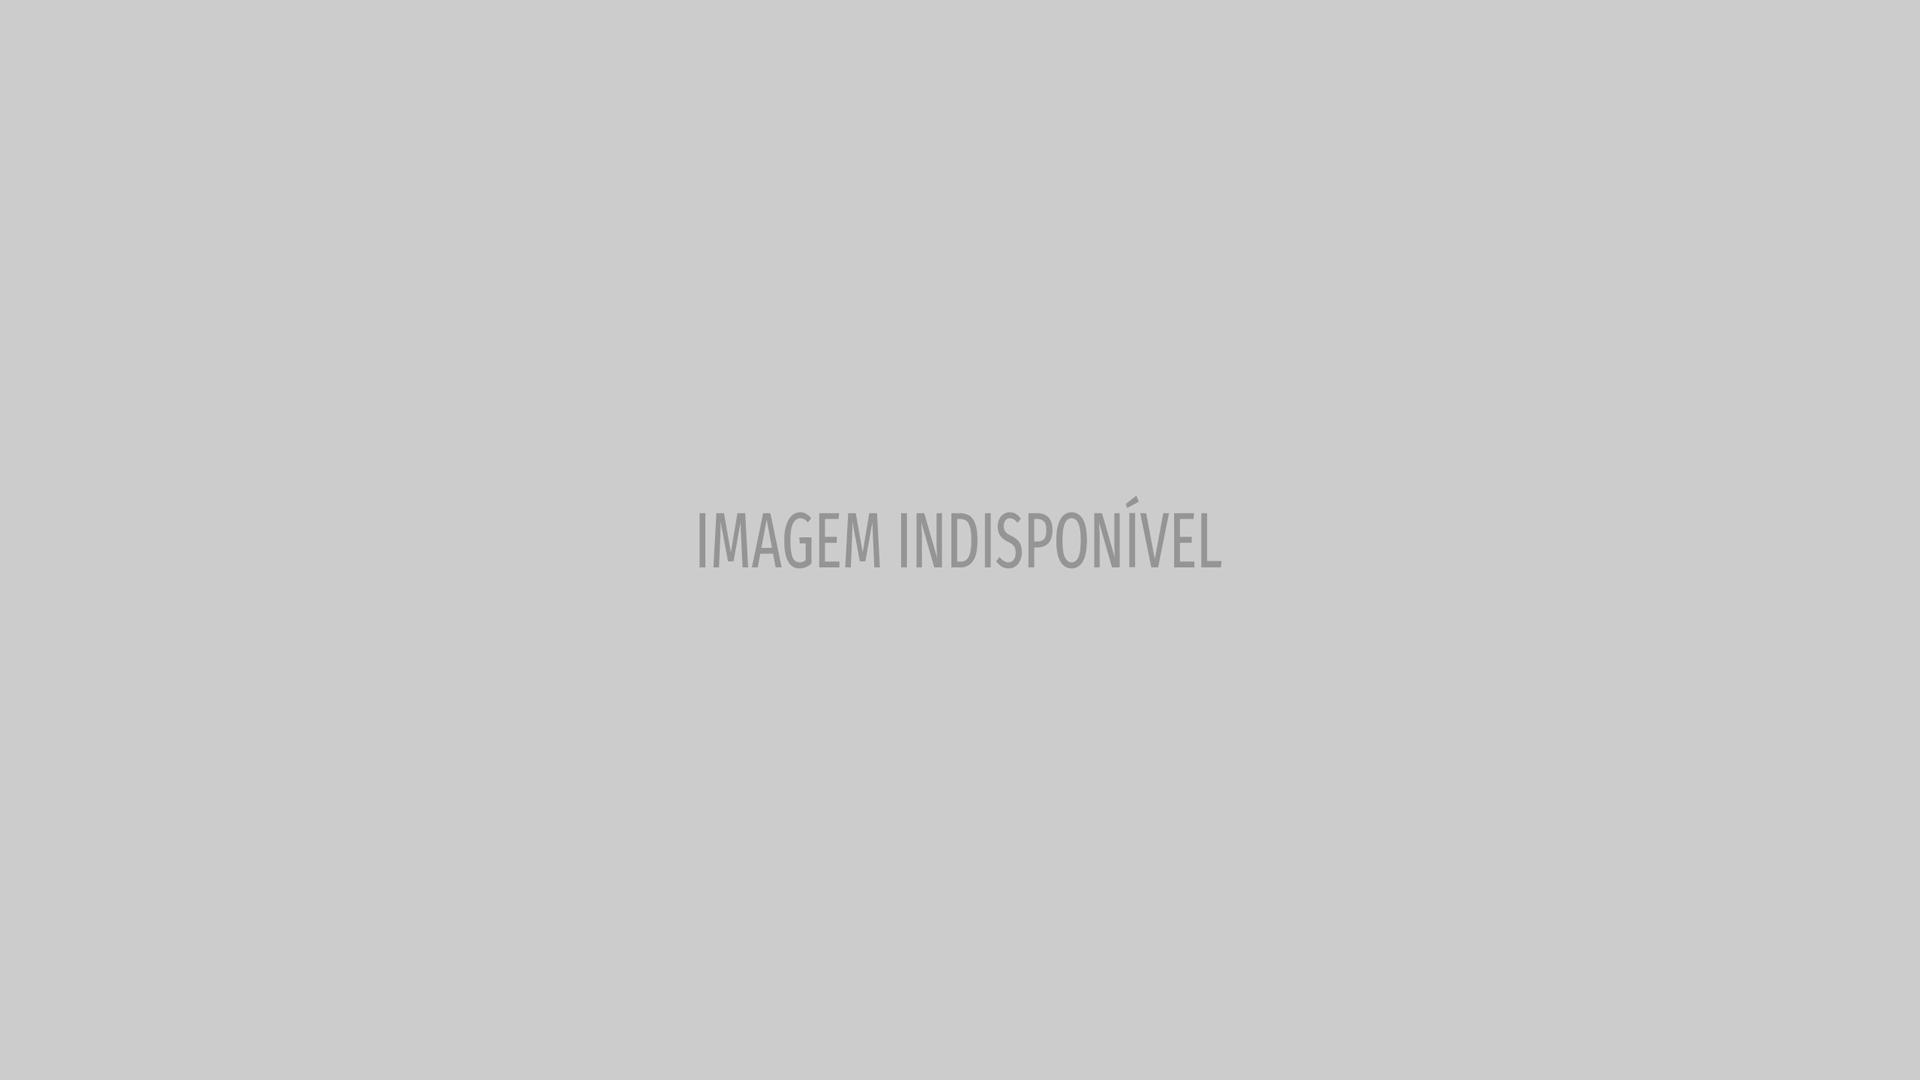 Pabllo Vittar posa de fio dental e é comparada a Kim Kardashian